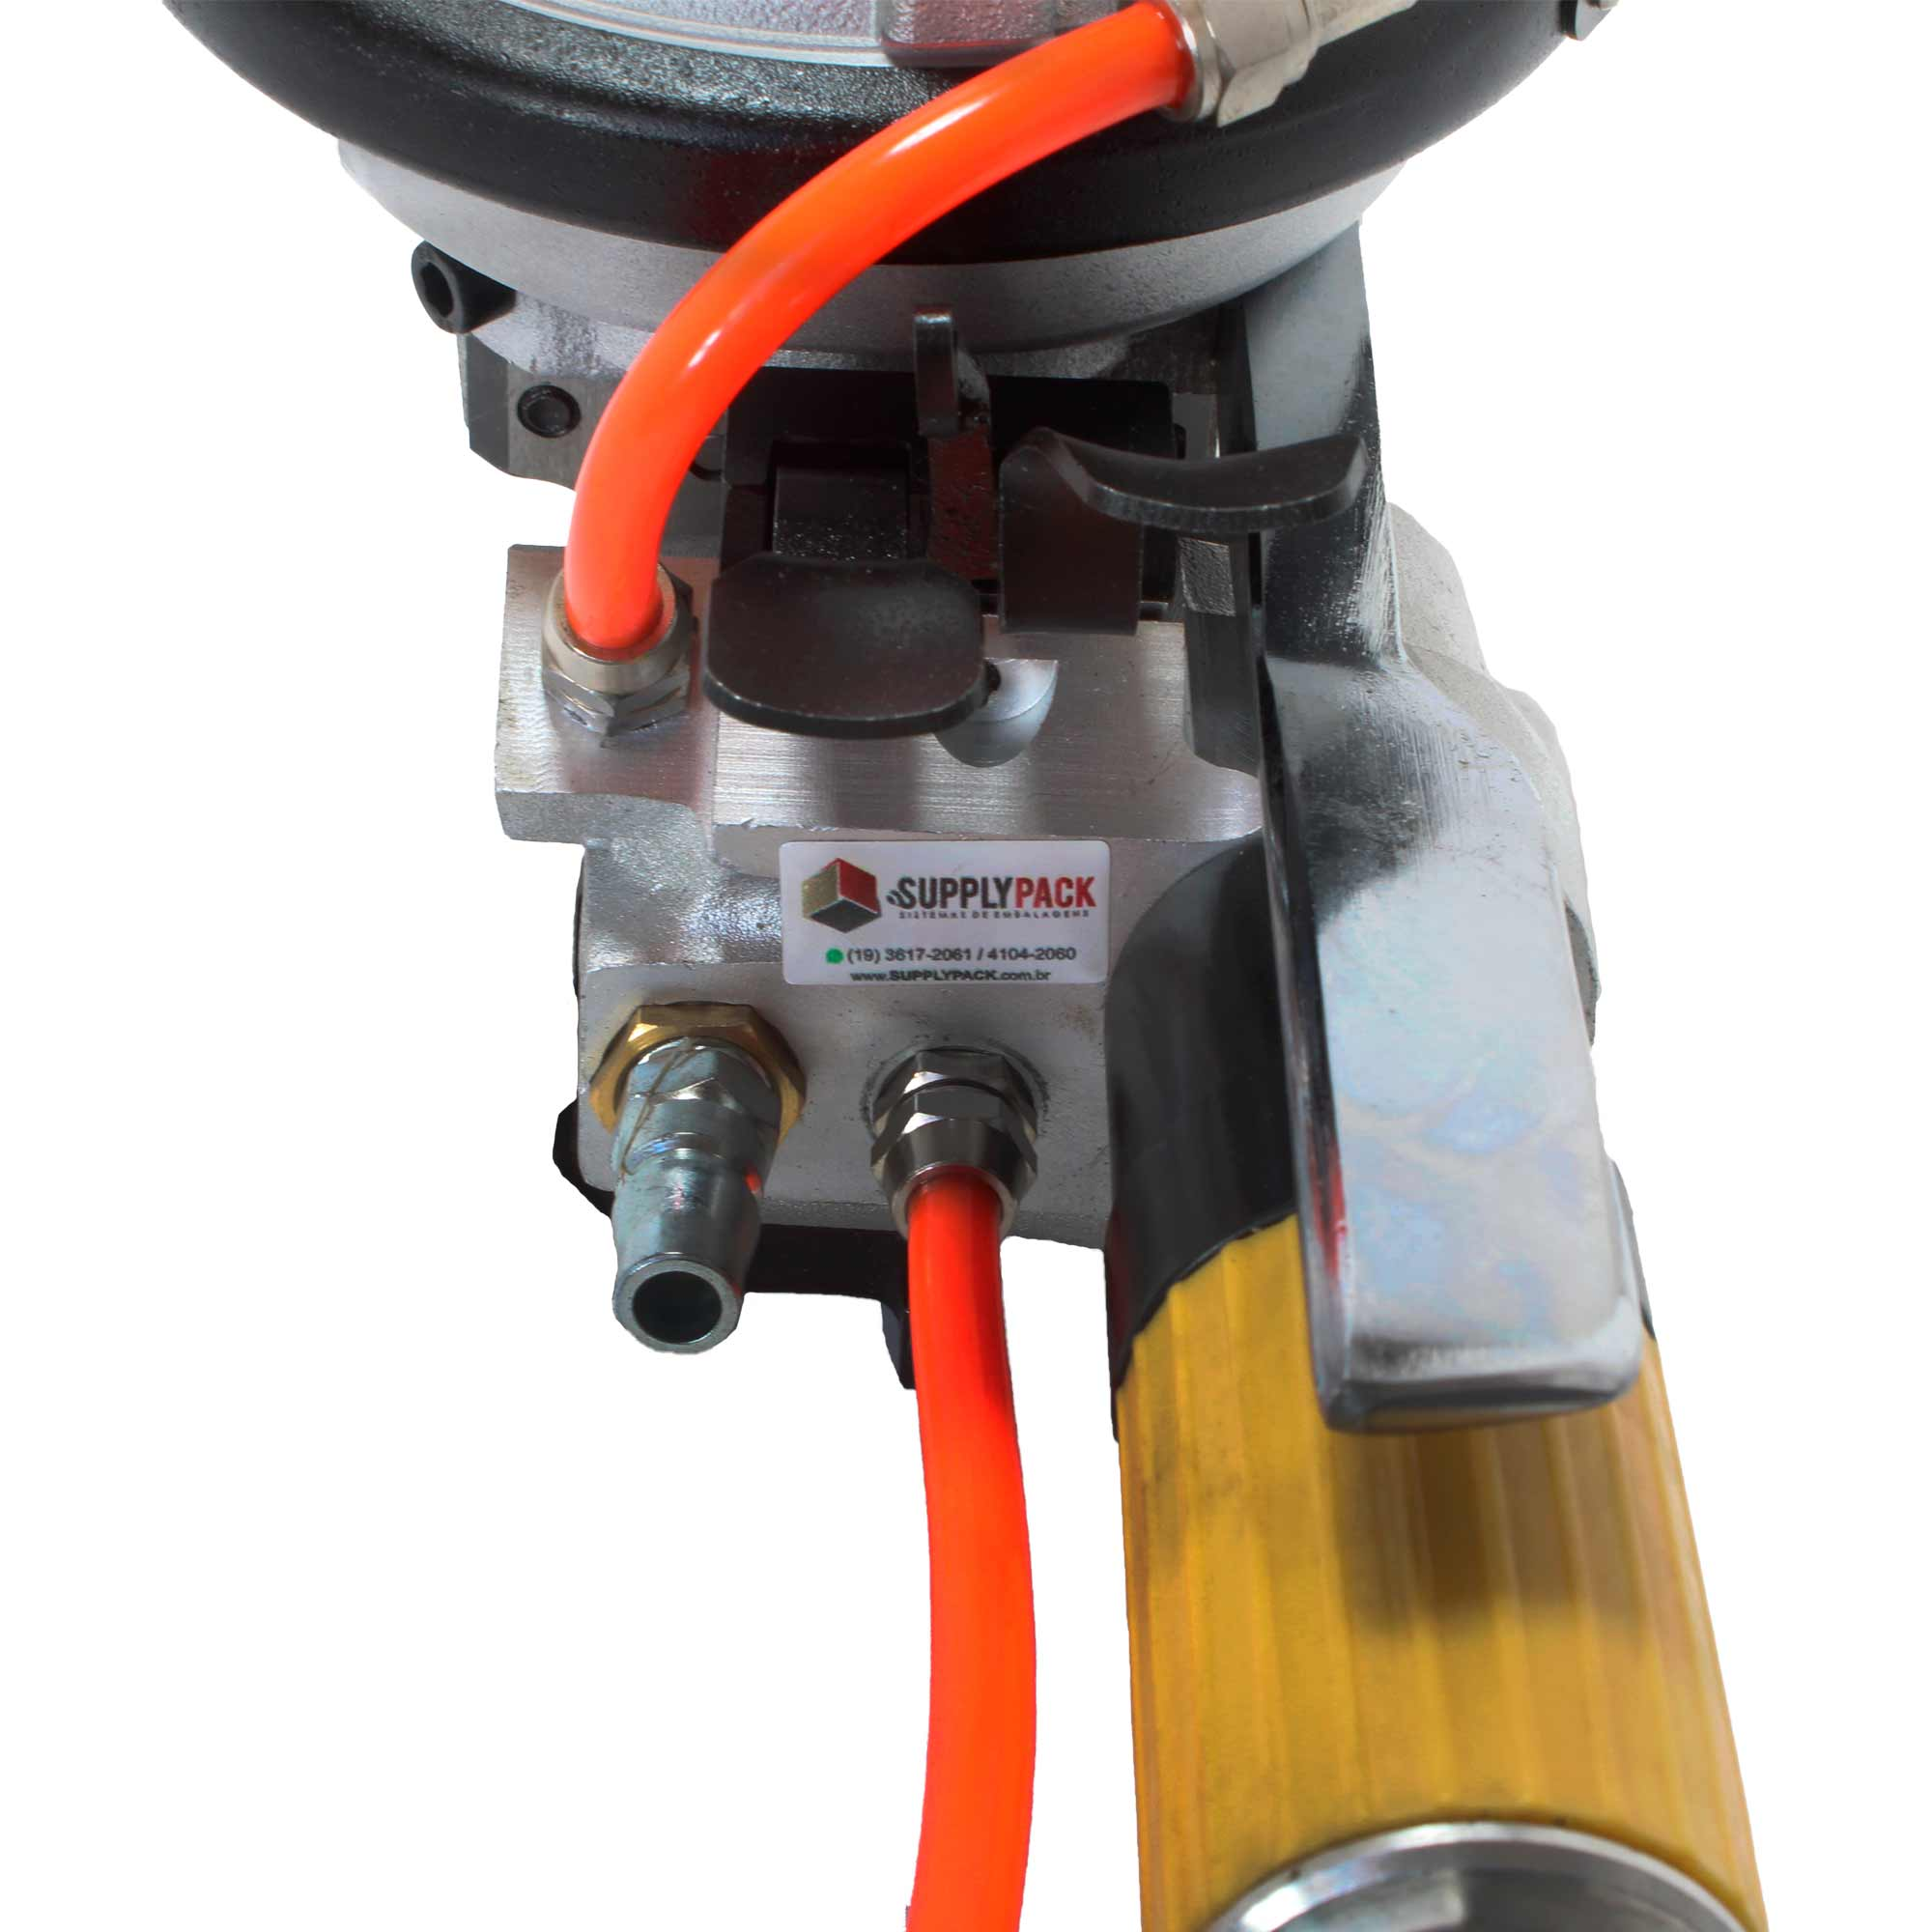 Esticador Pneumático Conjugado P/ fita de Aço 16 / 19 MM Estica / Crava / Corta Supplypack